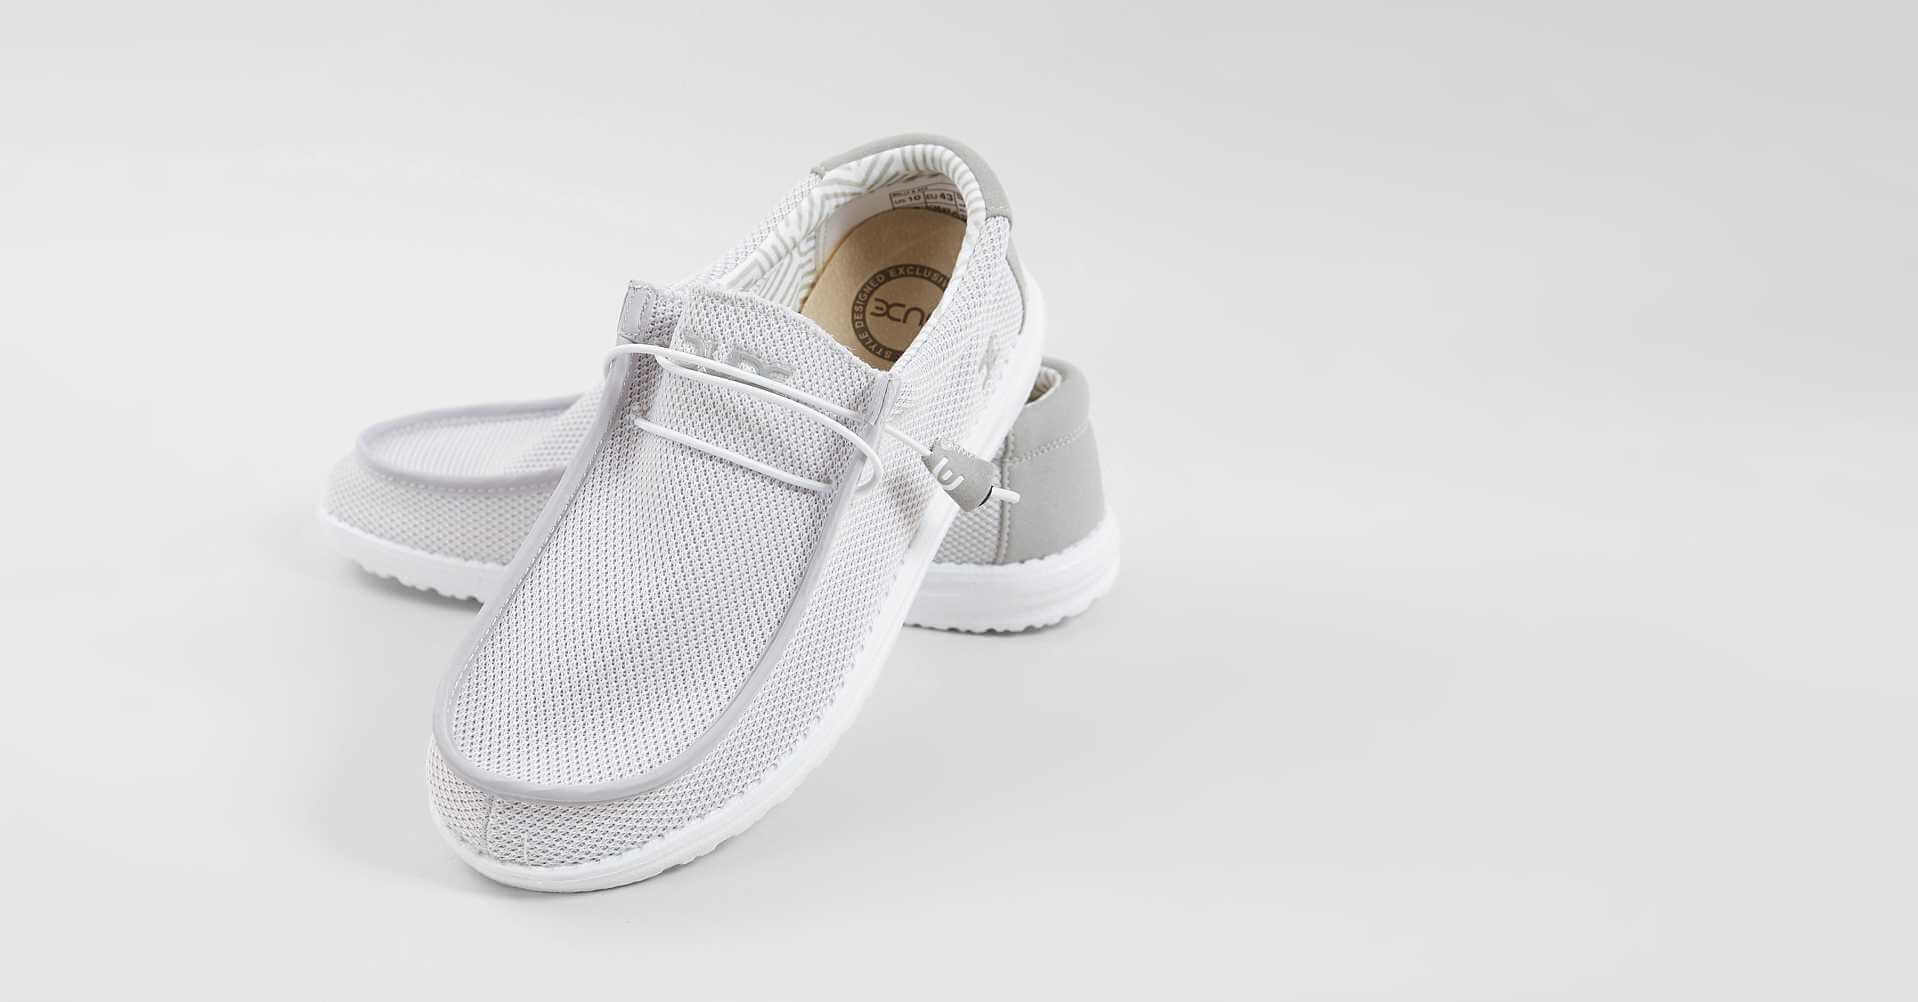 Hey Dude Wally B Sox Shoe - Men's Shoes in White Grey | Buckle